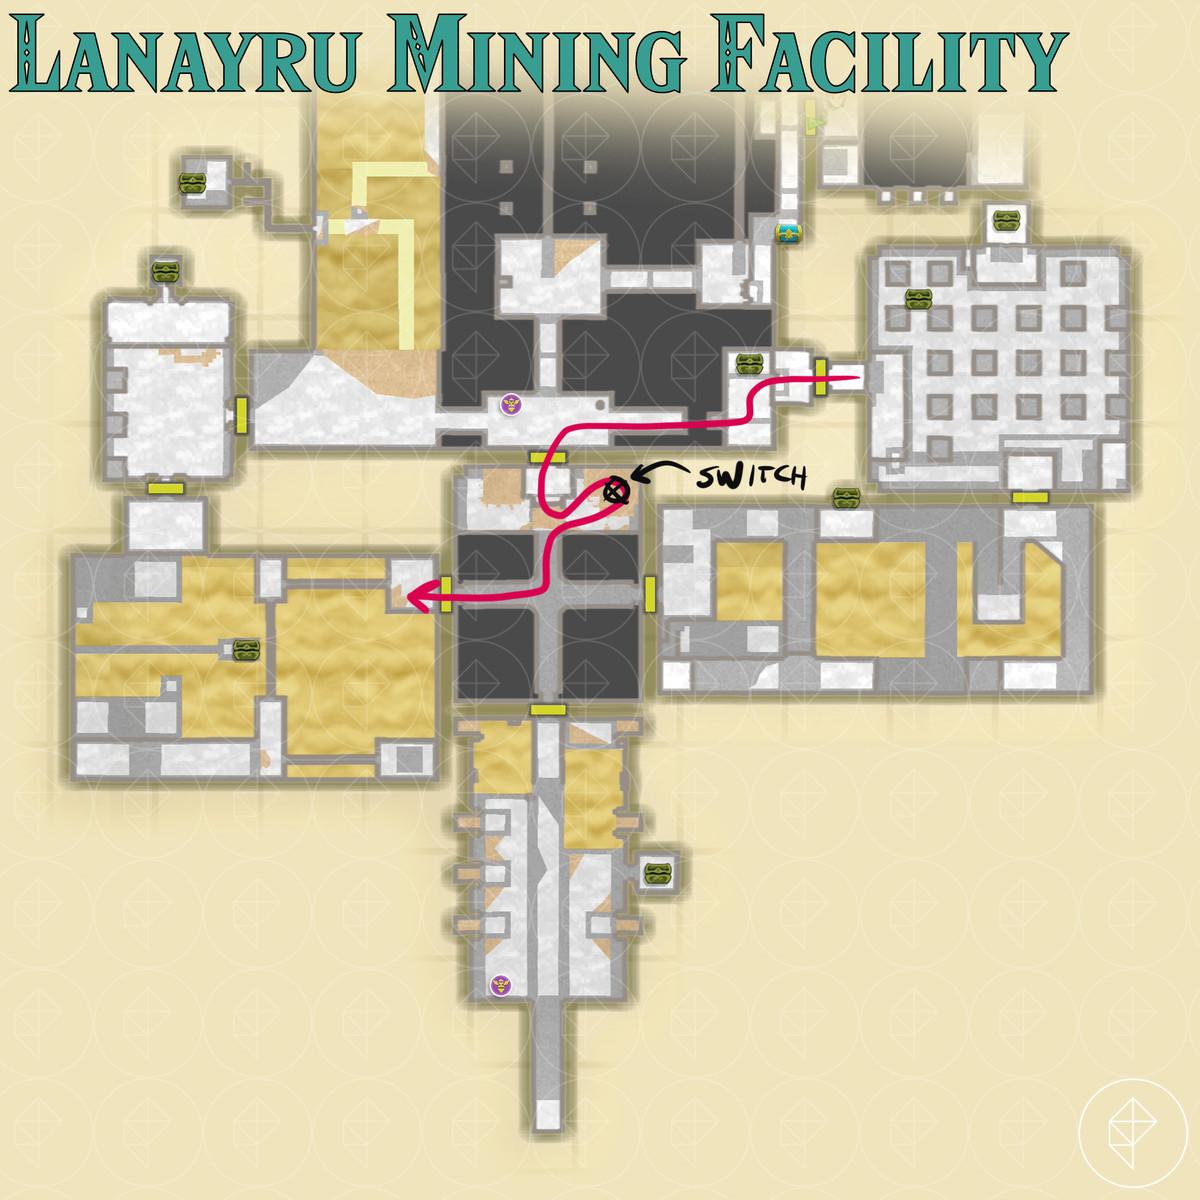 Lanayru Mining Facility walkthrough – Zelda: Skyward Sword HD guide